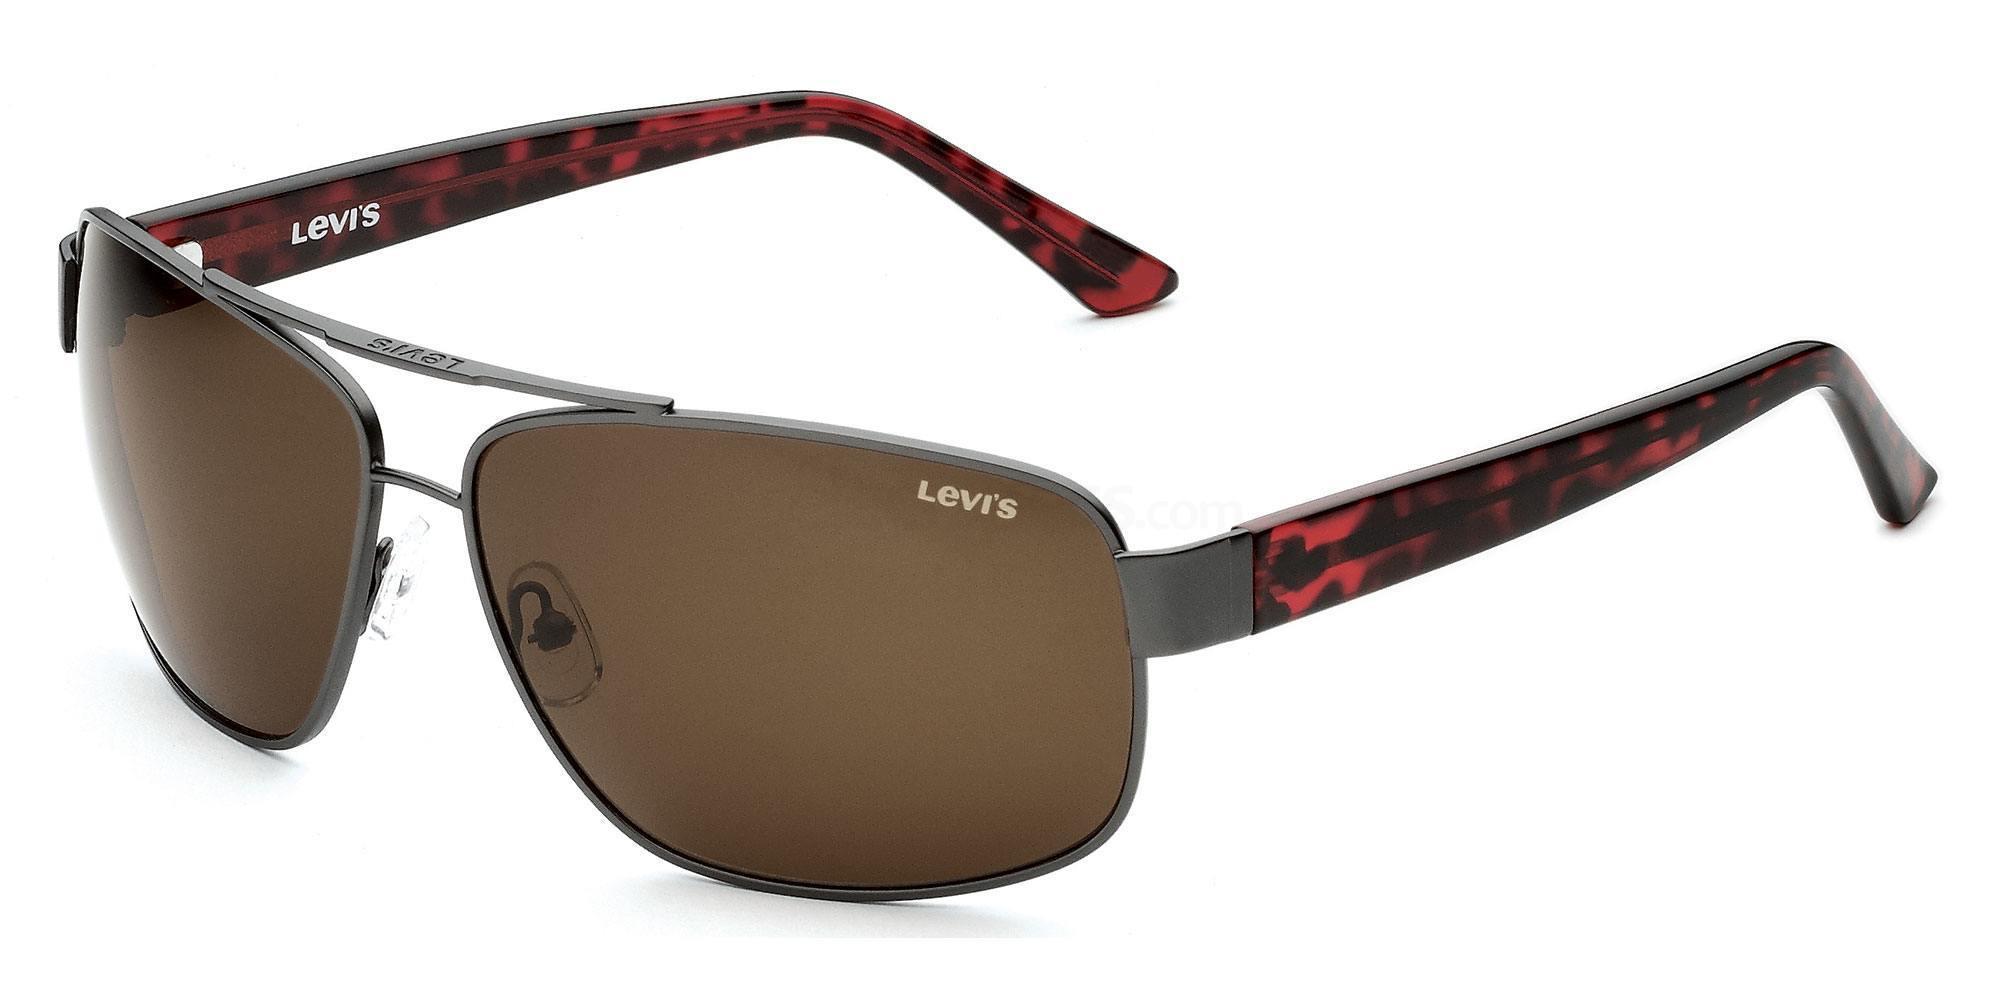 LO22376/01 LO22376 Sunglasses, Levi's Eyewear